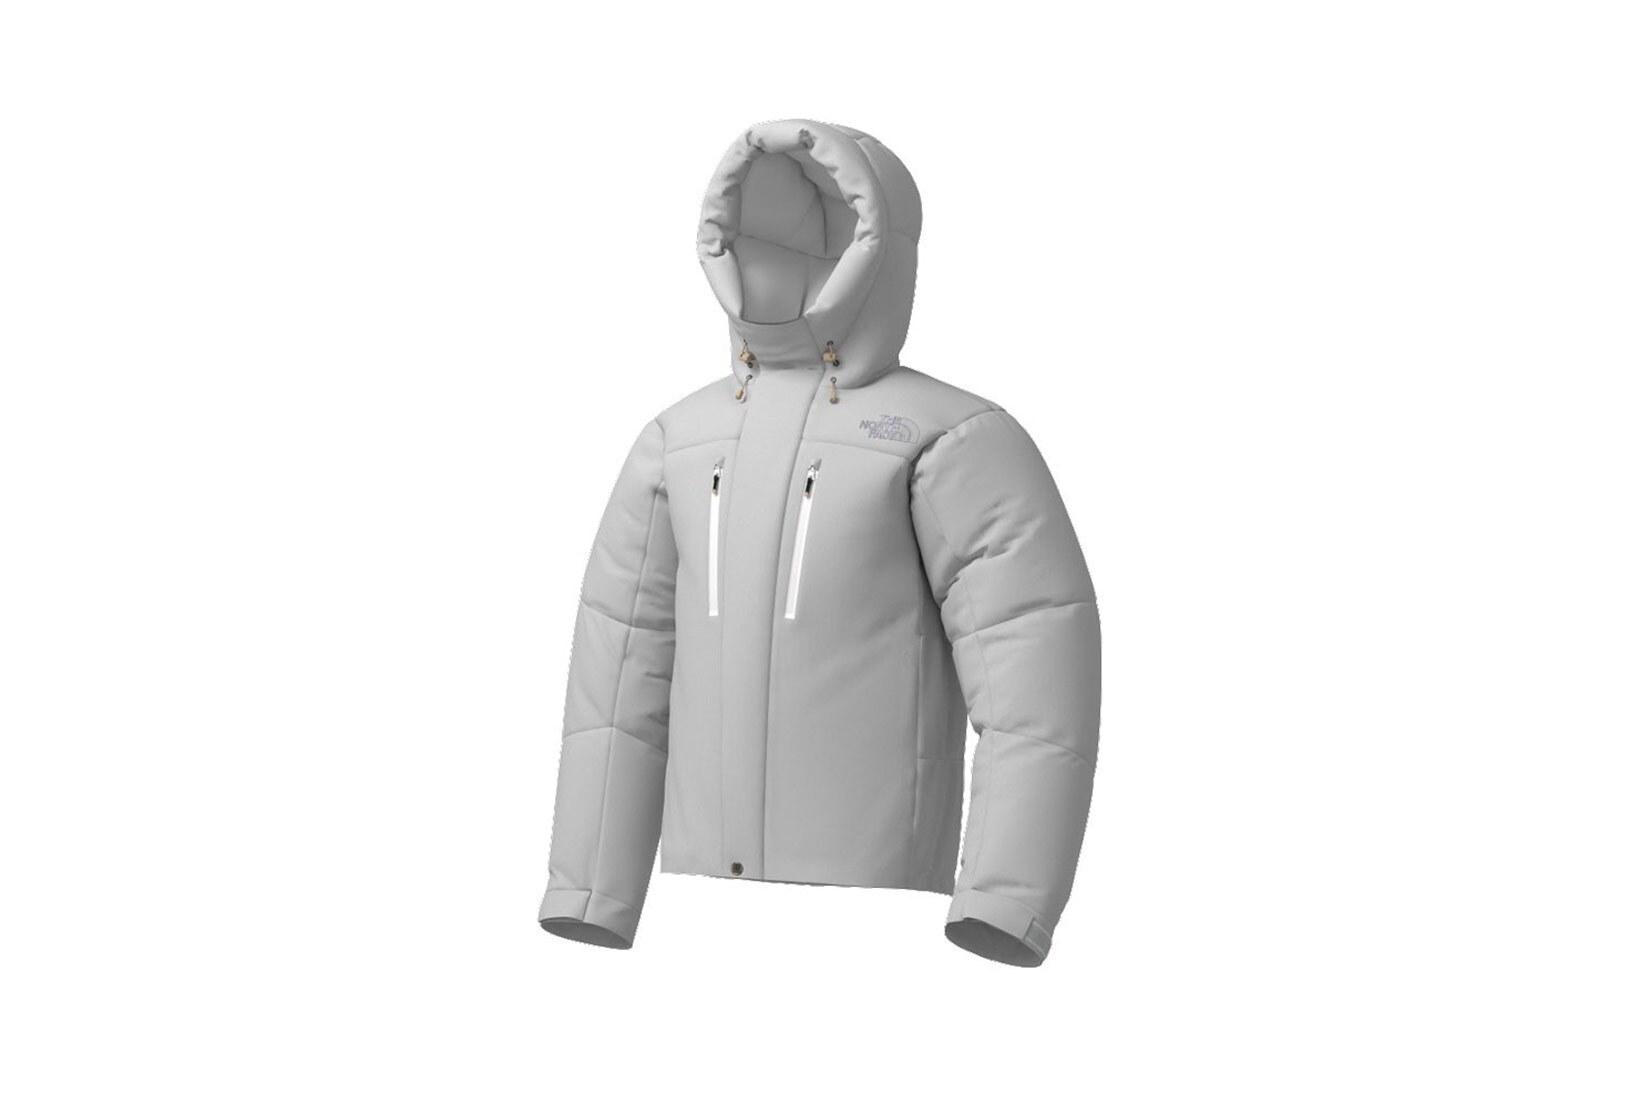 The North Face Japan Custom jackets